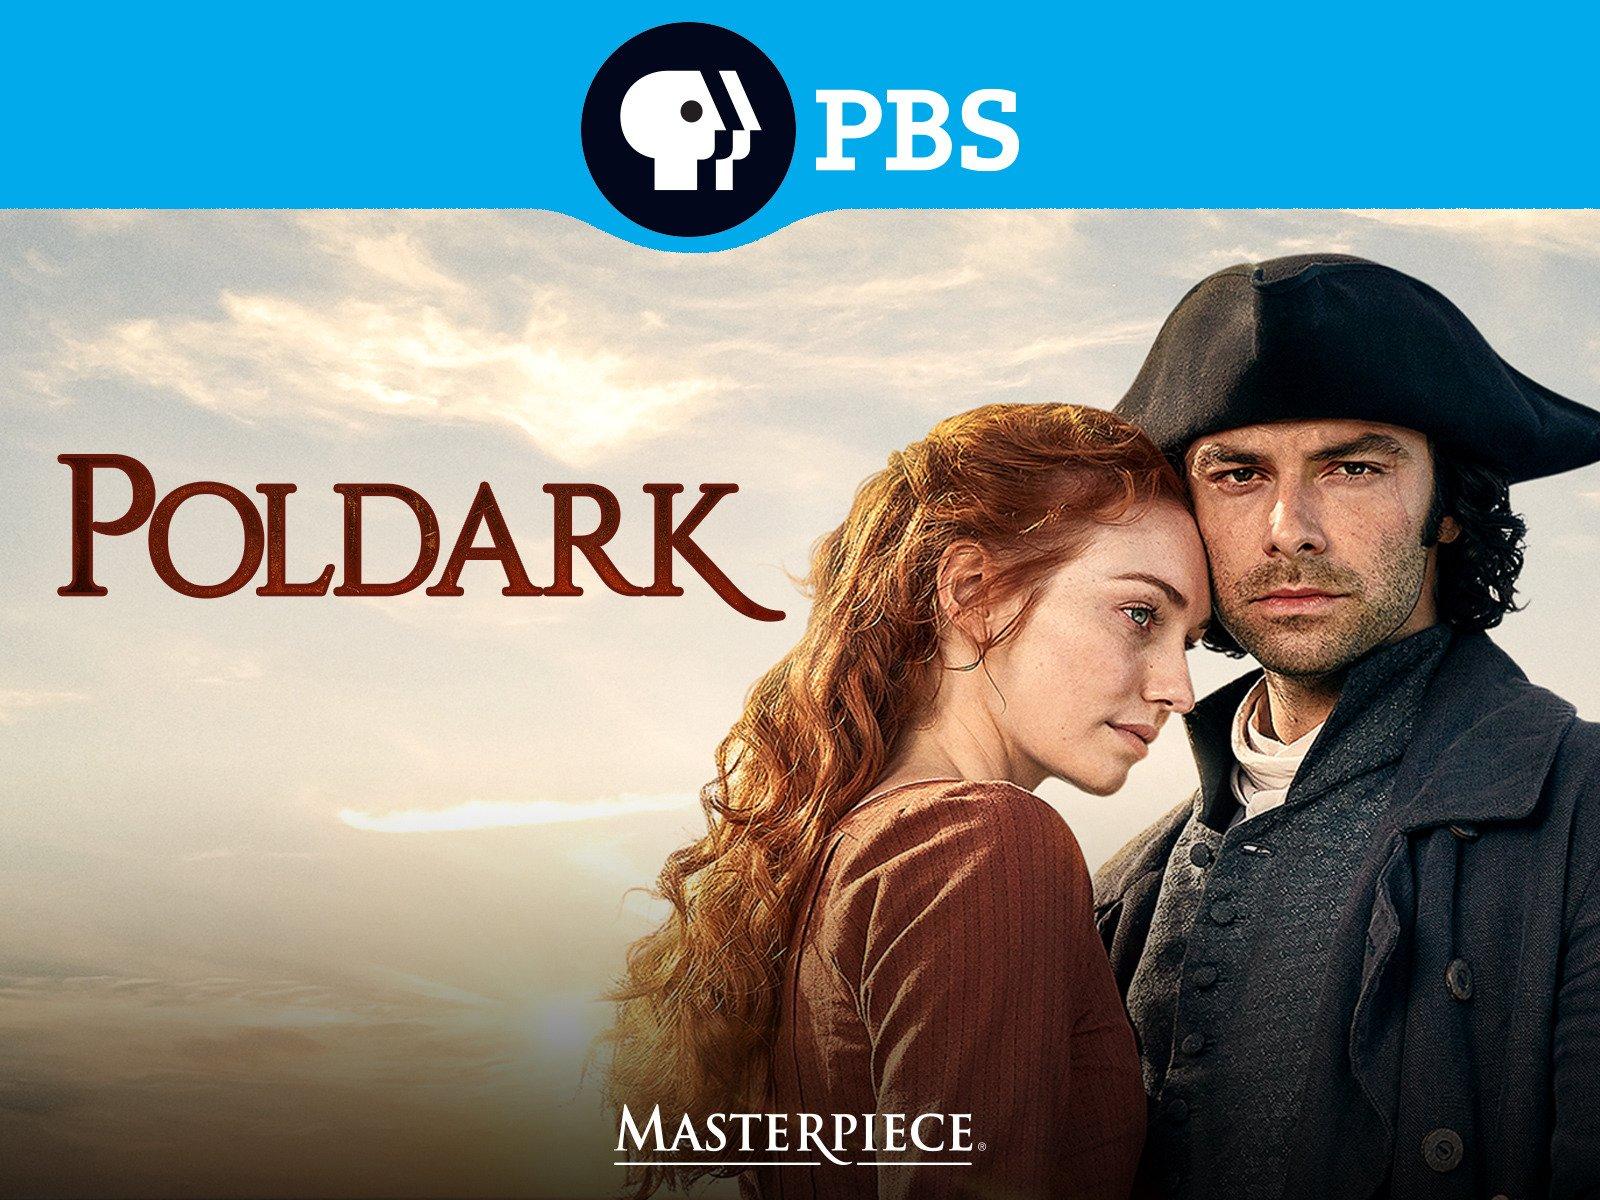 poldark season 2 episode 2 download